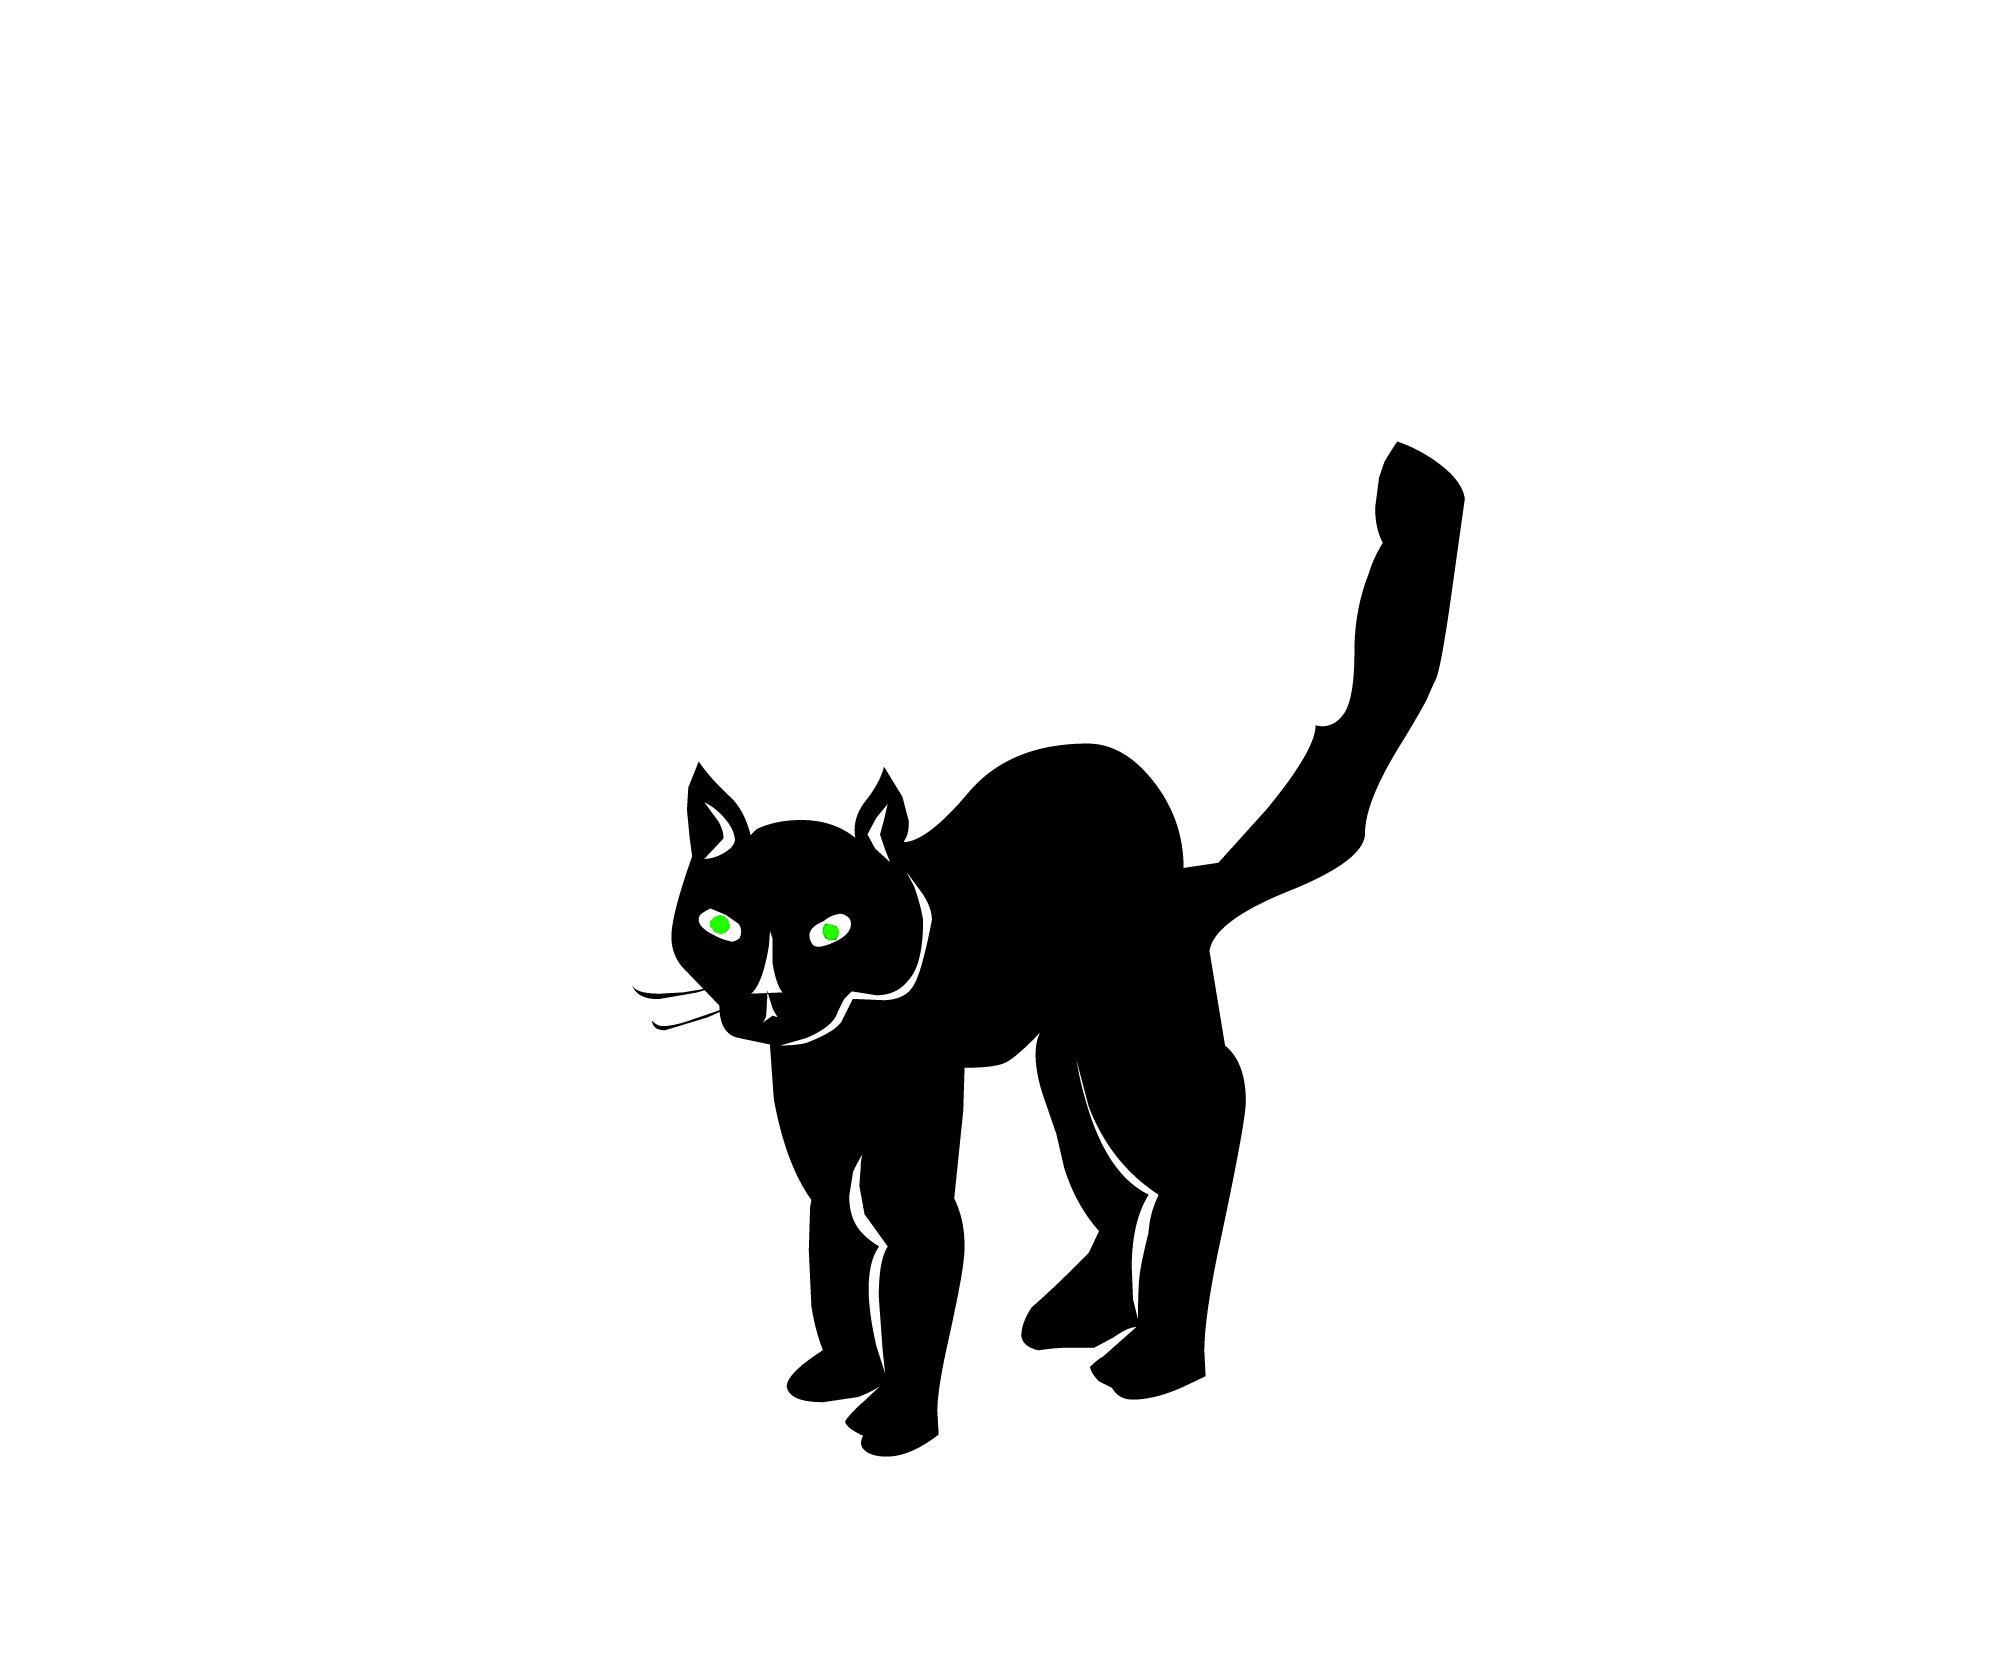 Spooky clipart halloween black cat Black Clip Cartoon cartoon Halloween